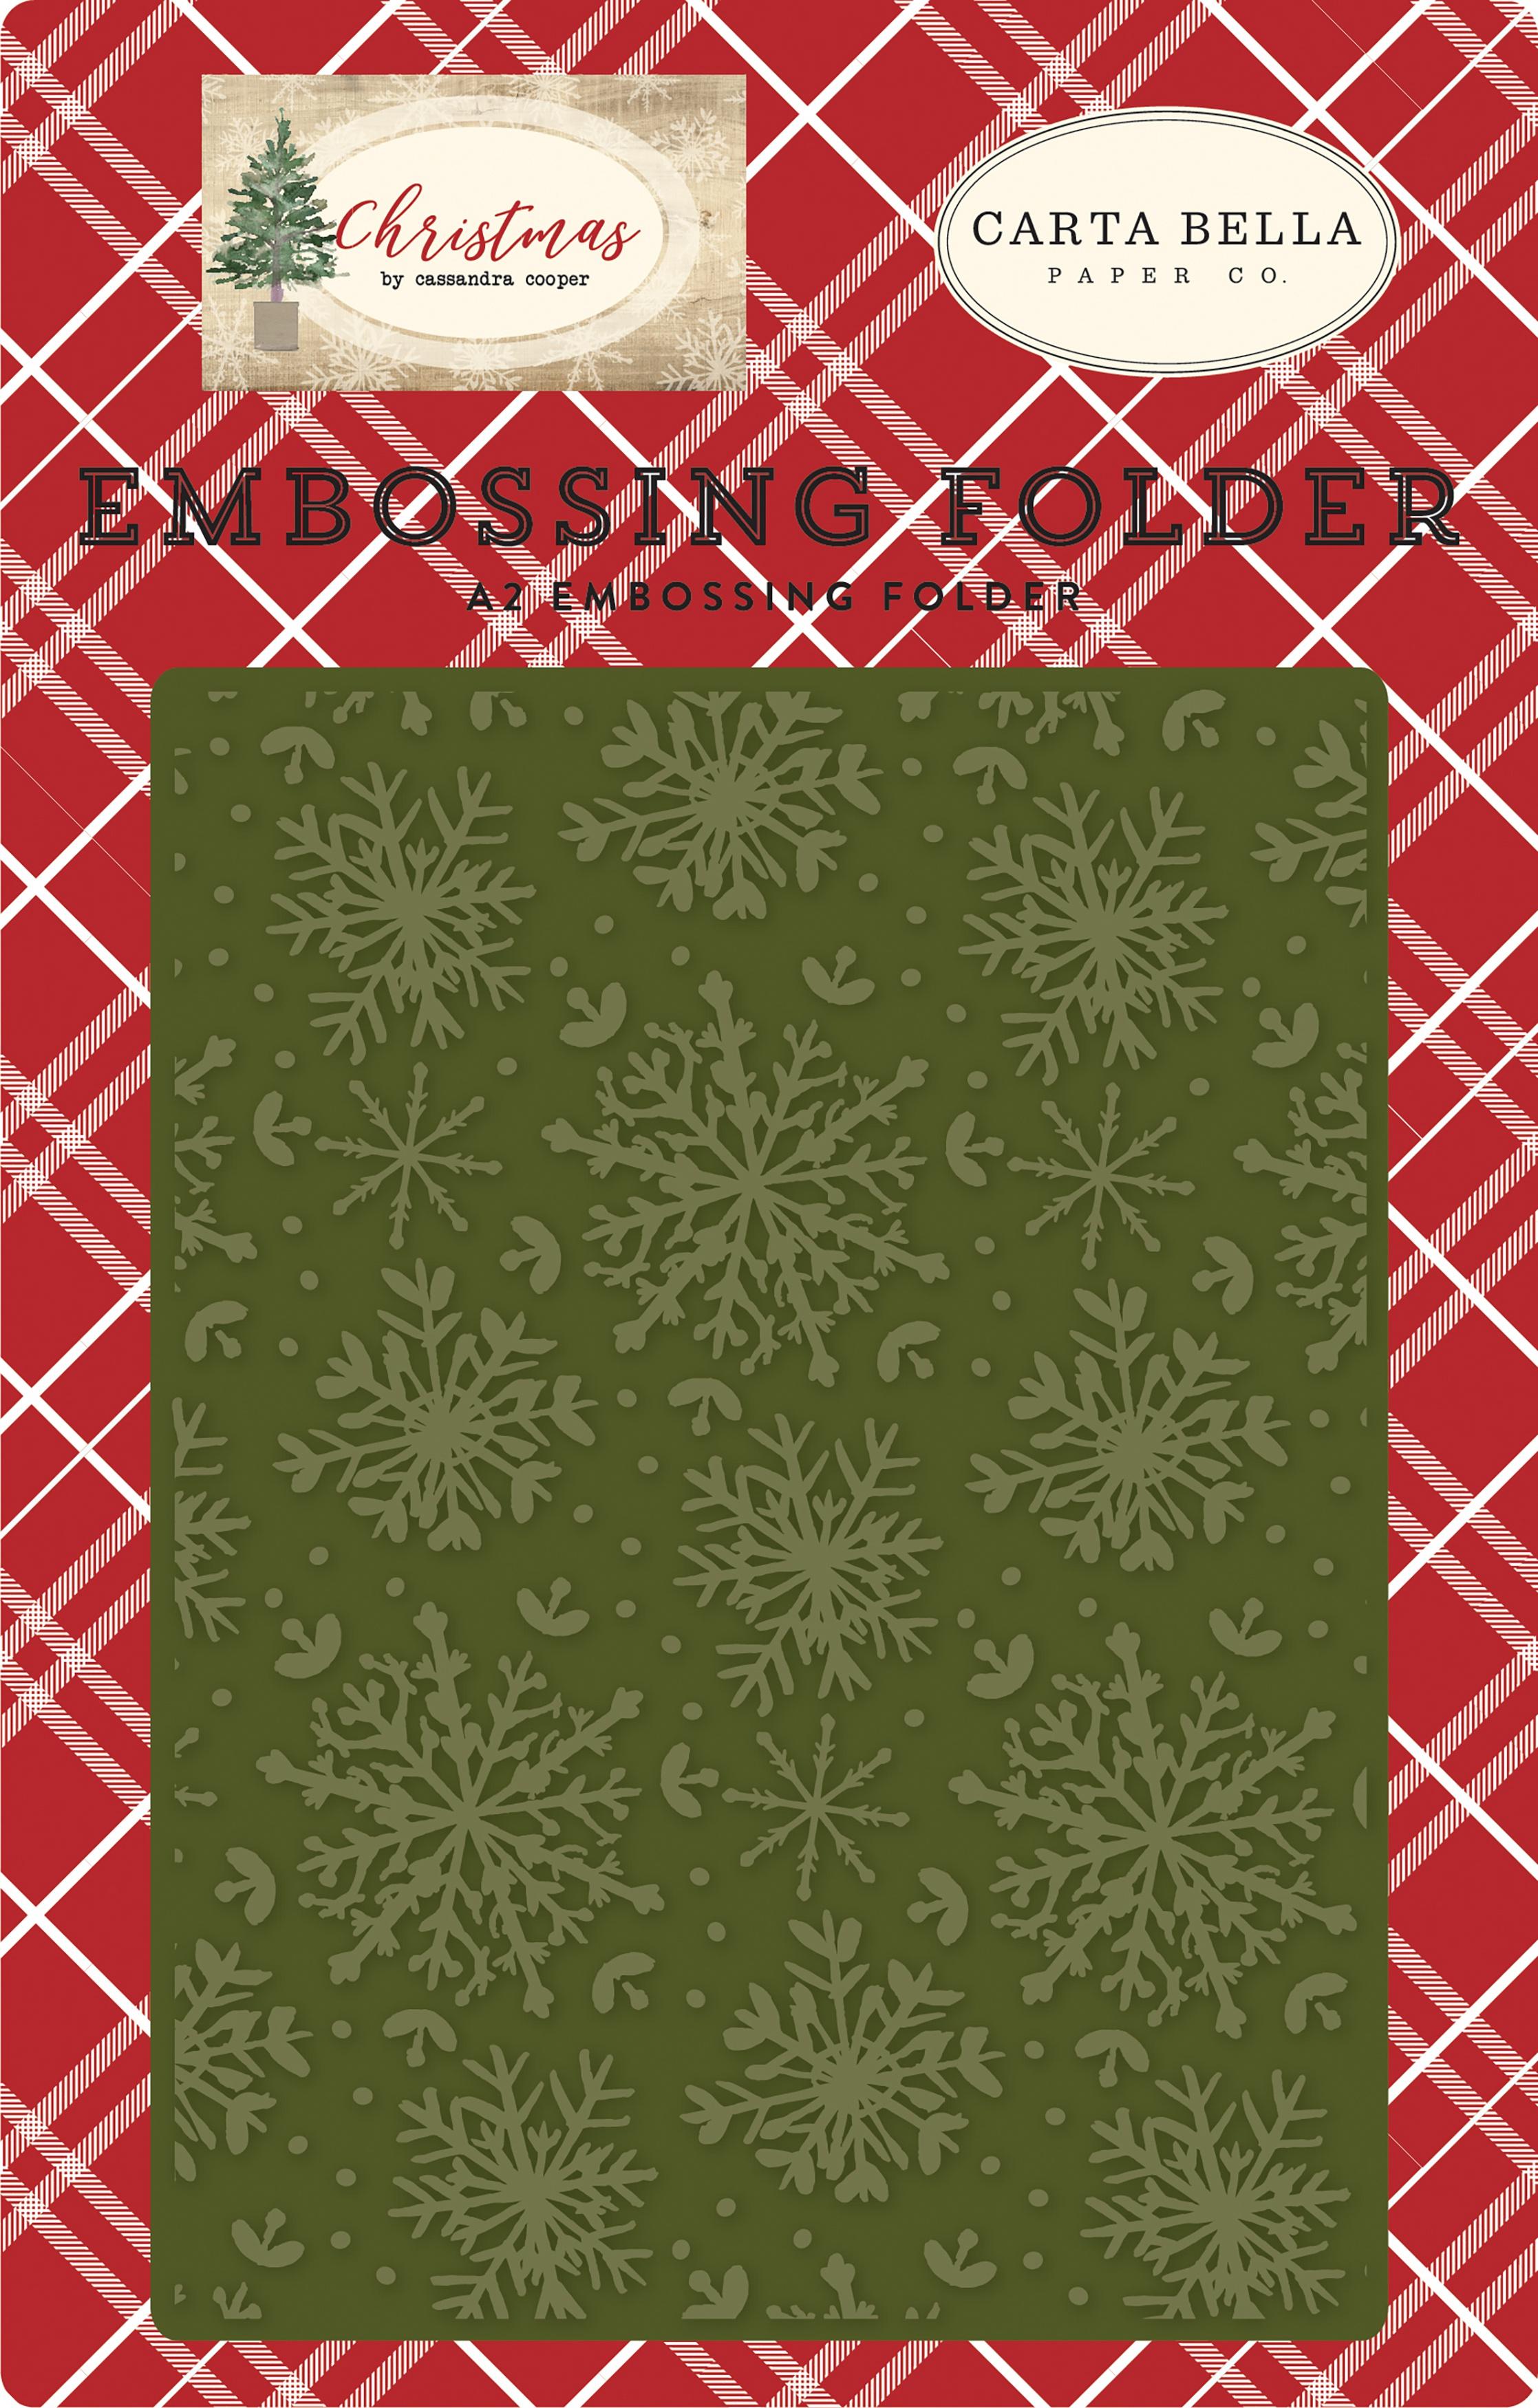 Carta Bella Embossing Folder A2-Jolly Snowflakes